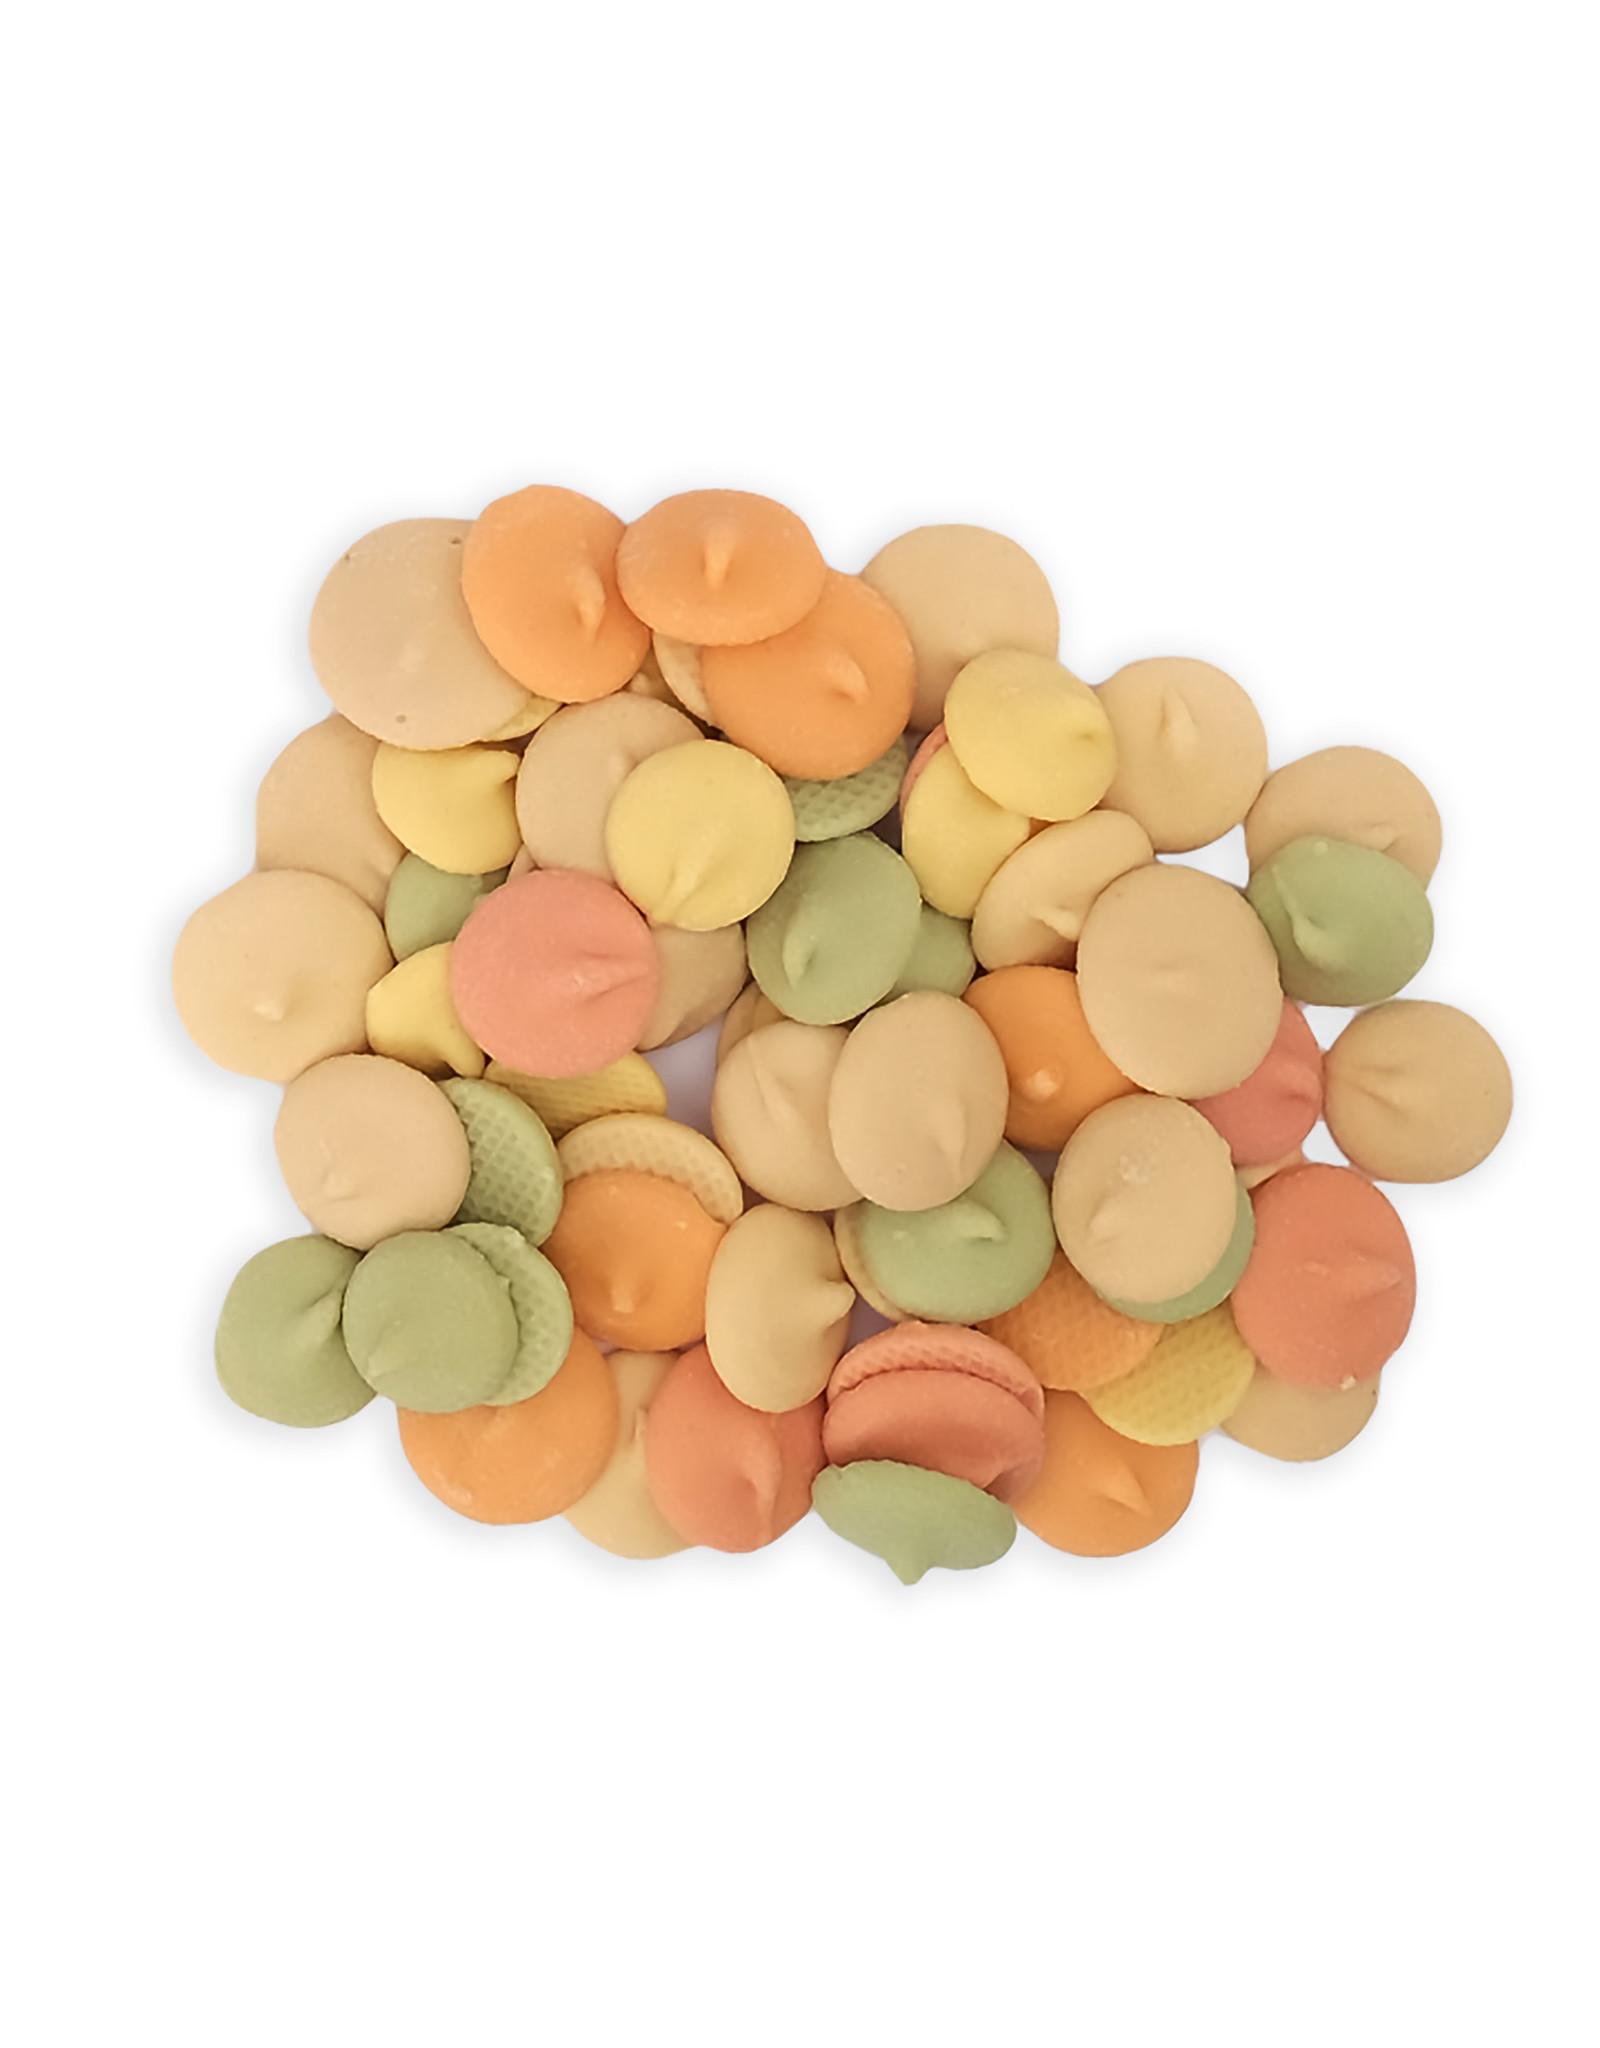 Living World Living World Small Animal Drops, Multi-Mix Flavour, 75 g (2.6 oz)